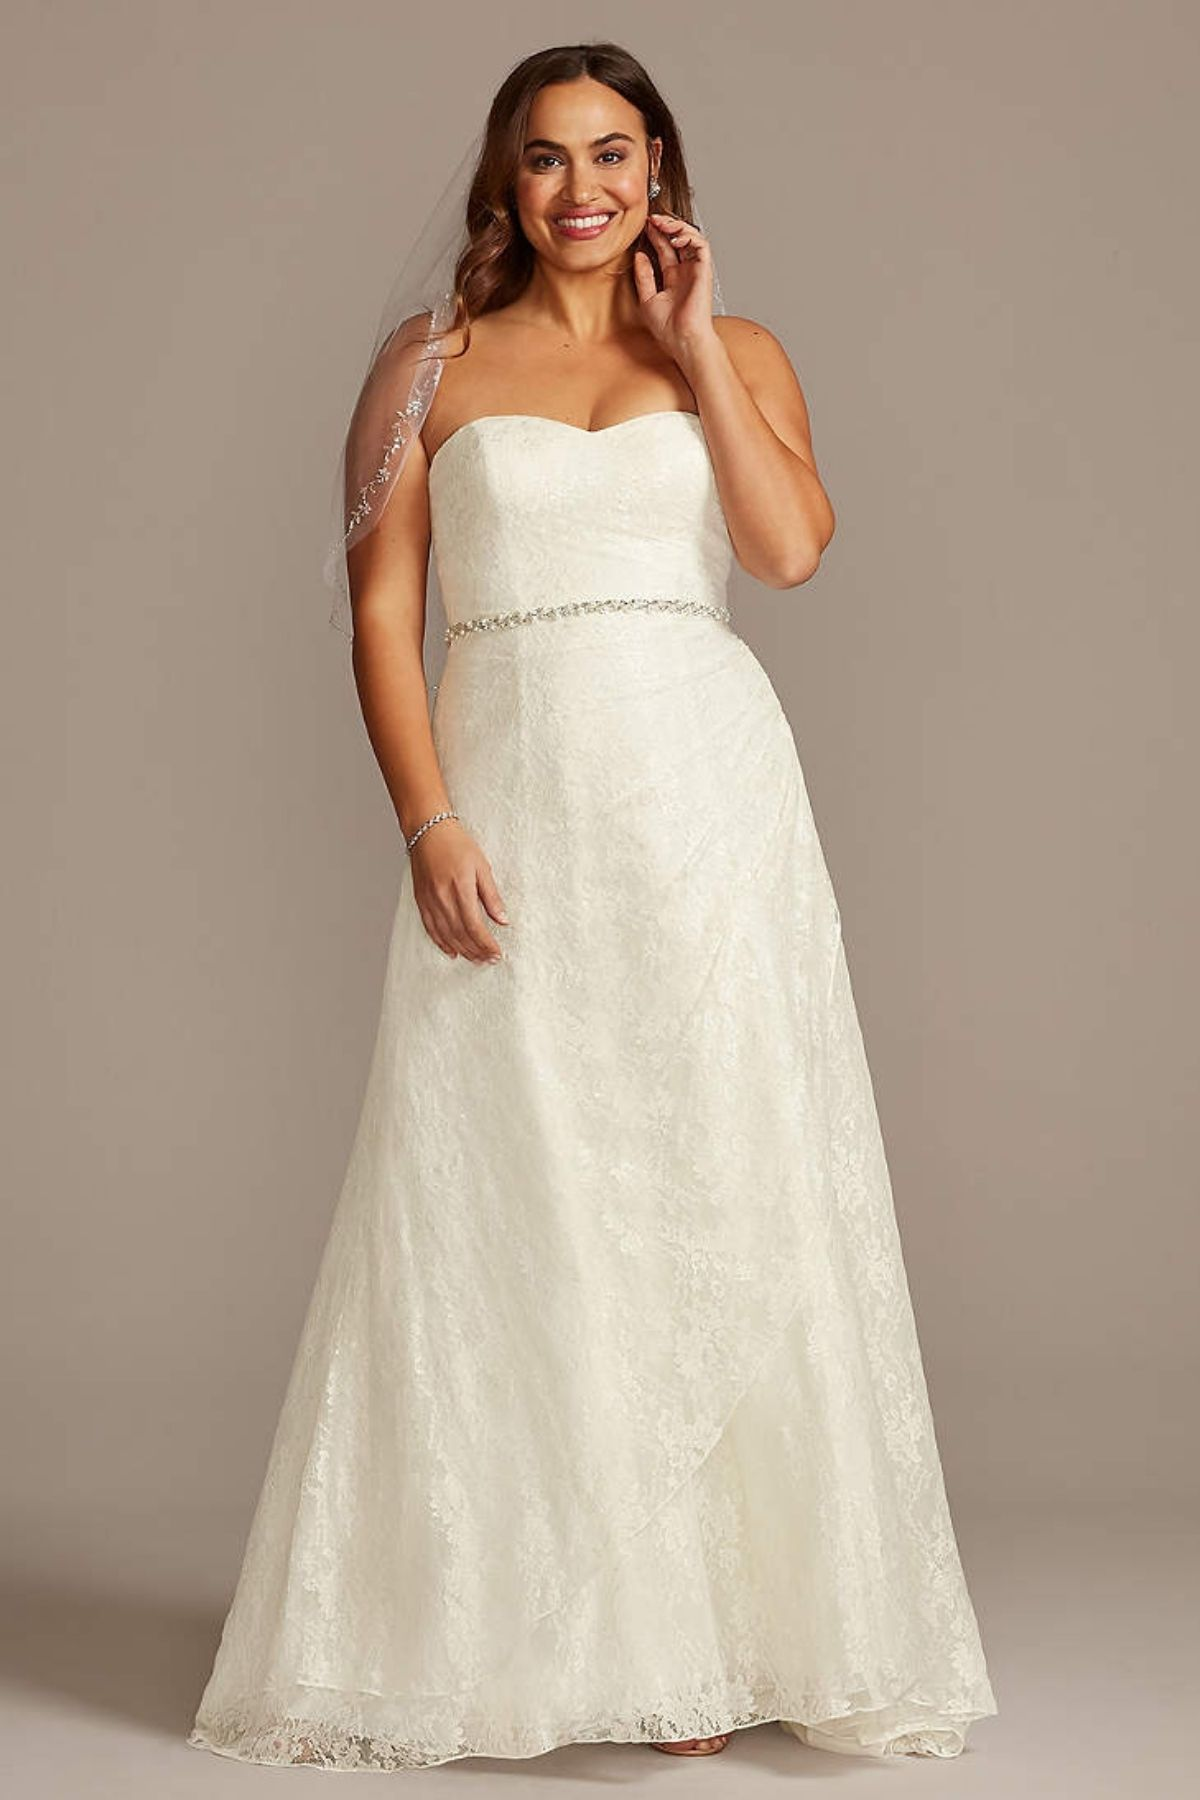 7. Allover Lace Plus Size A-Line Wedding Dress